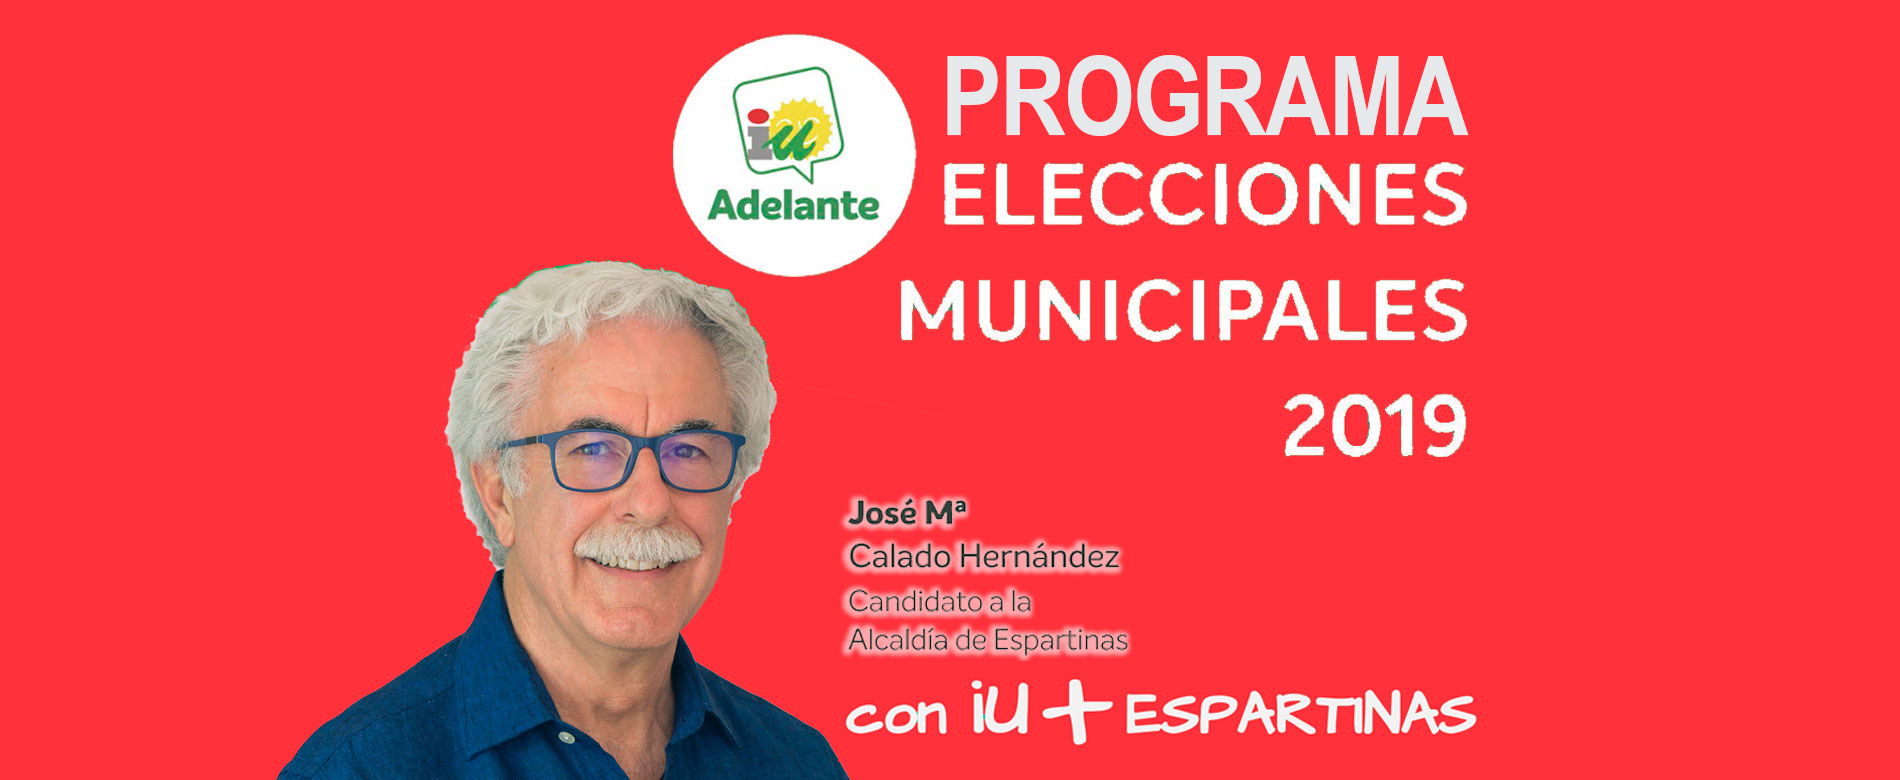 candidatoalcaldiaespartina3